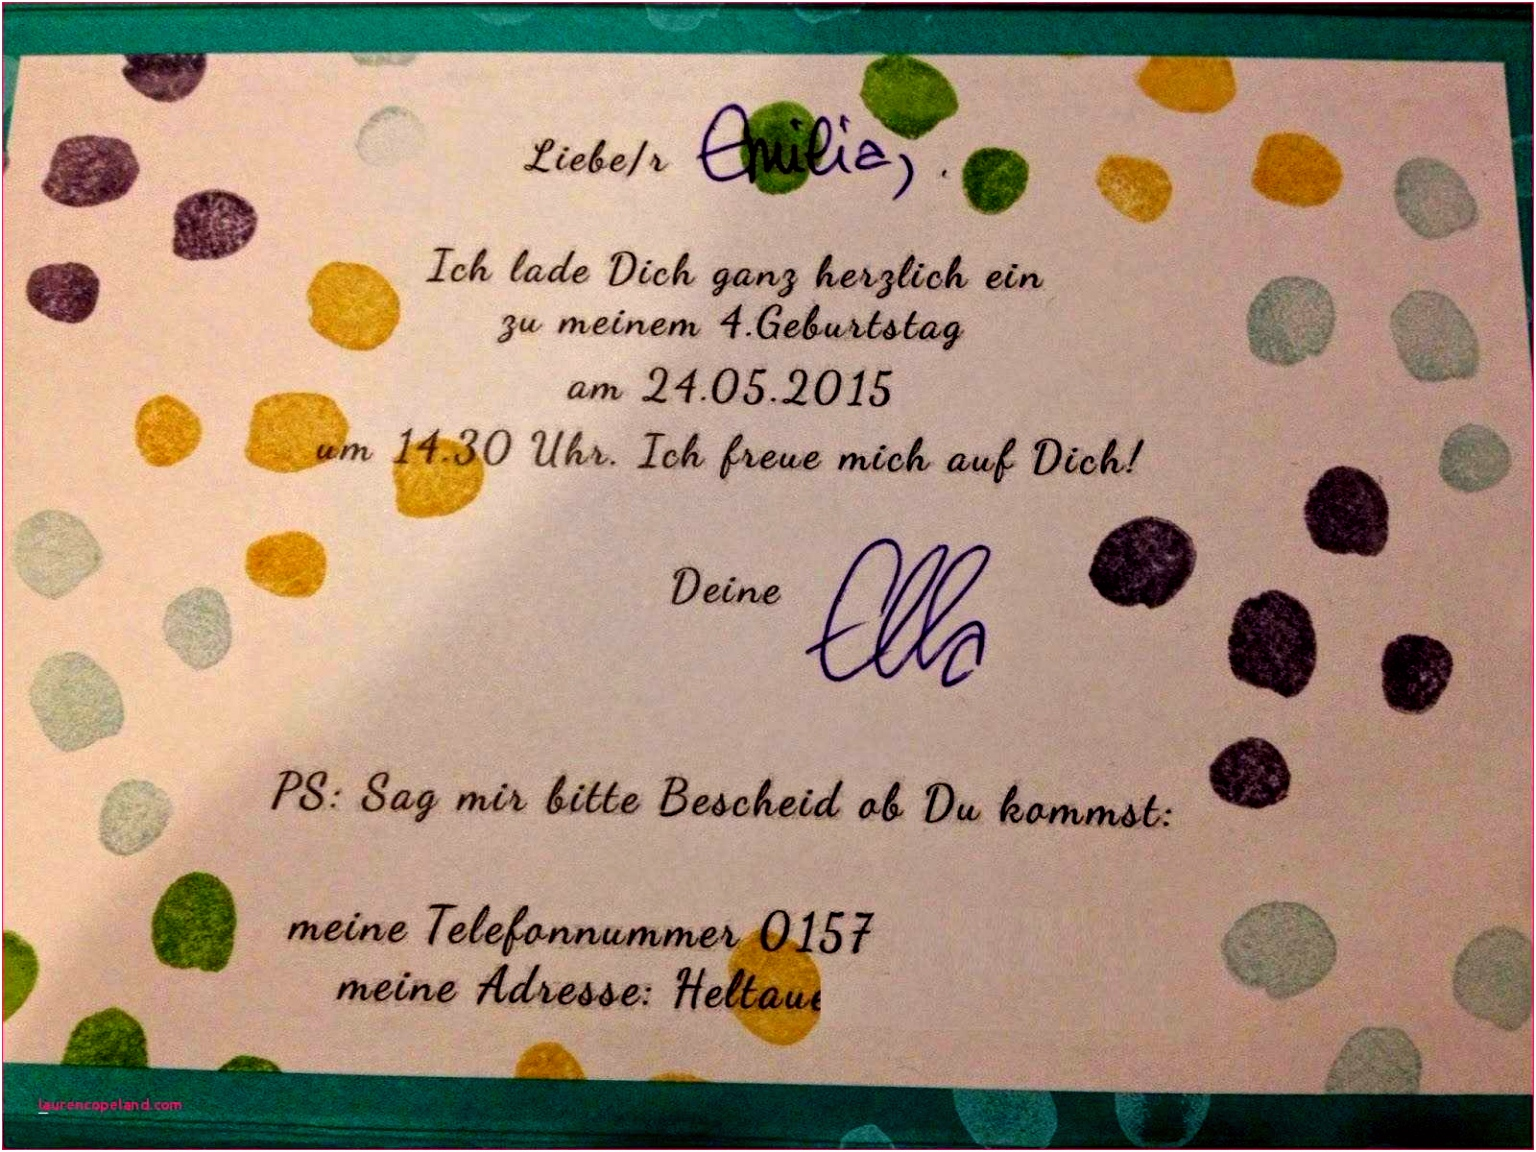 Postkarte Schreiben Vorlage Postkarte Umzug Schön Umzug Postkarte